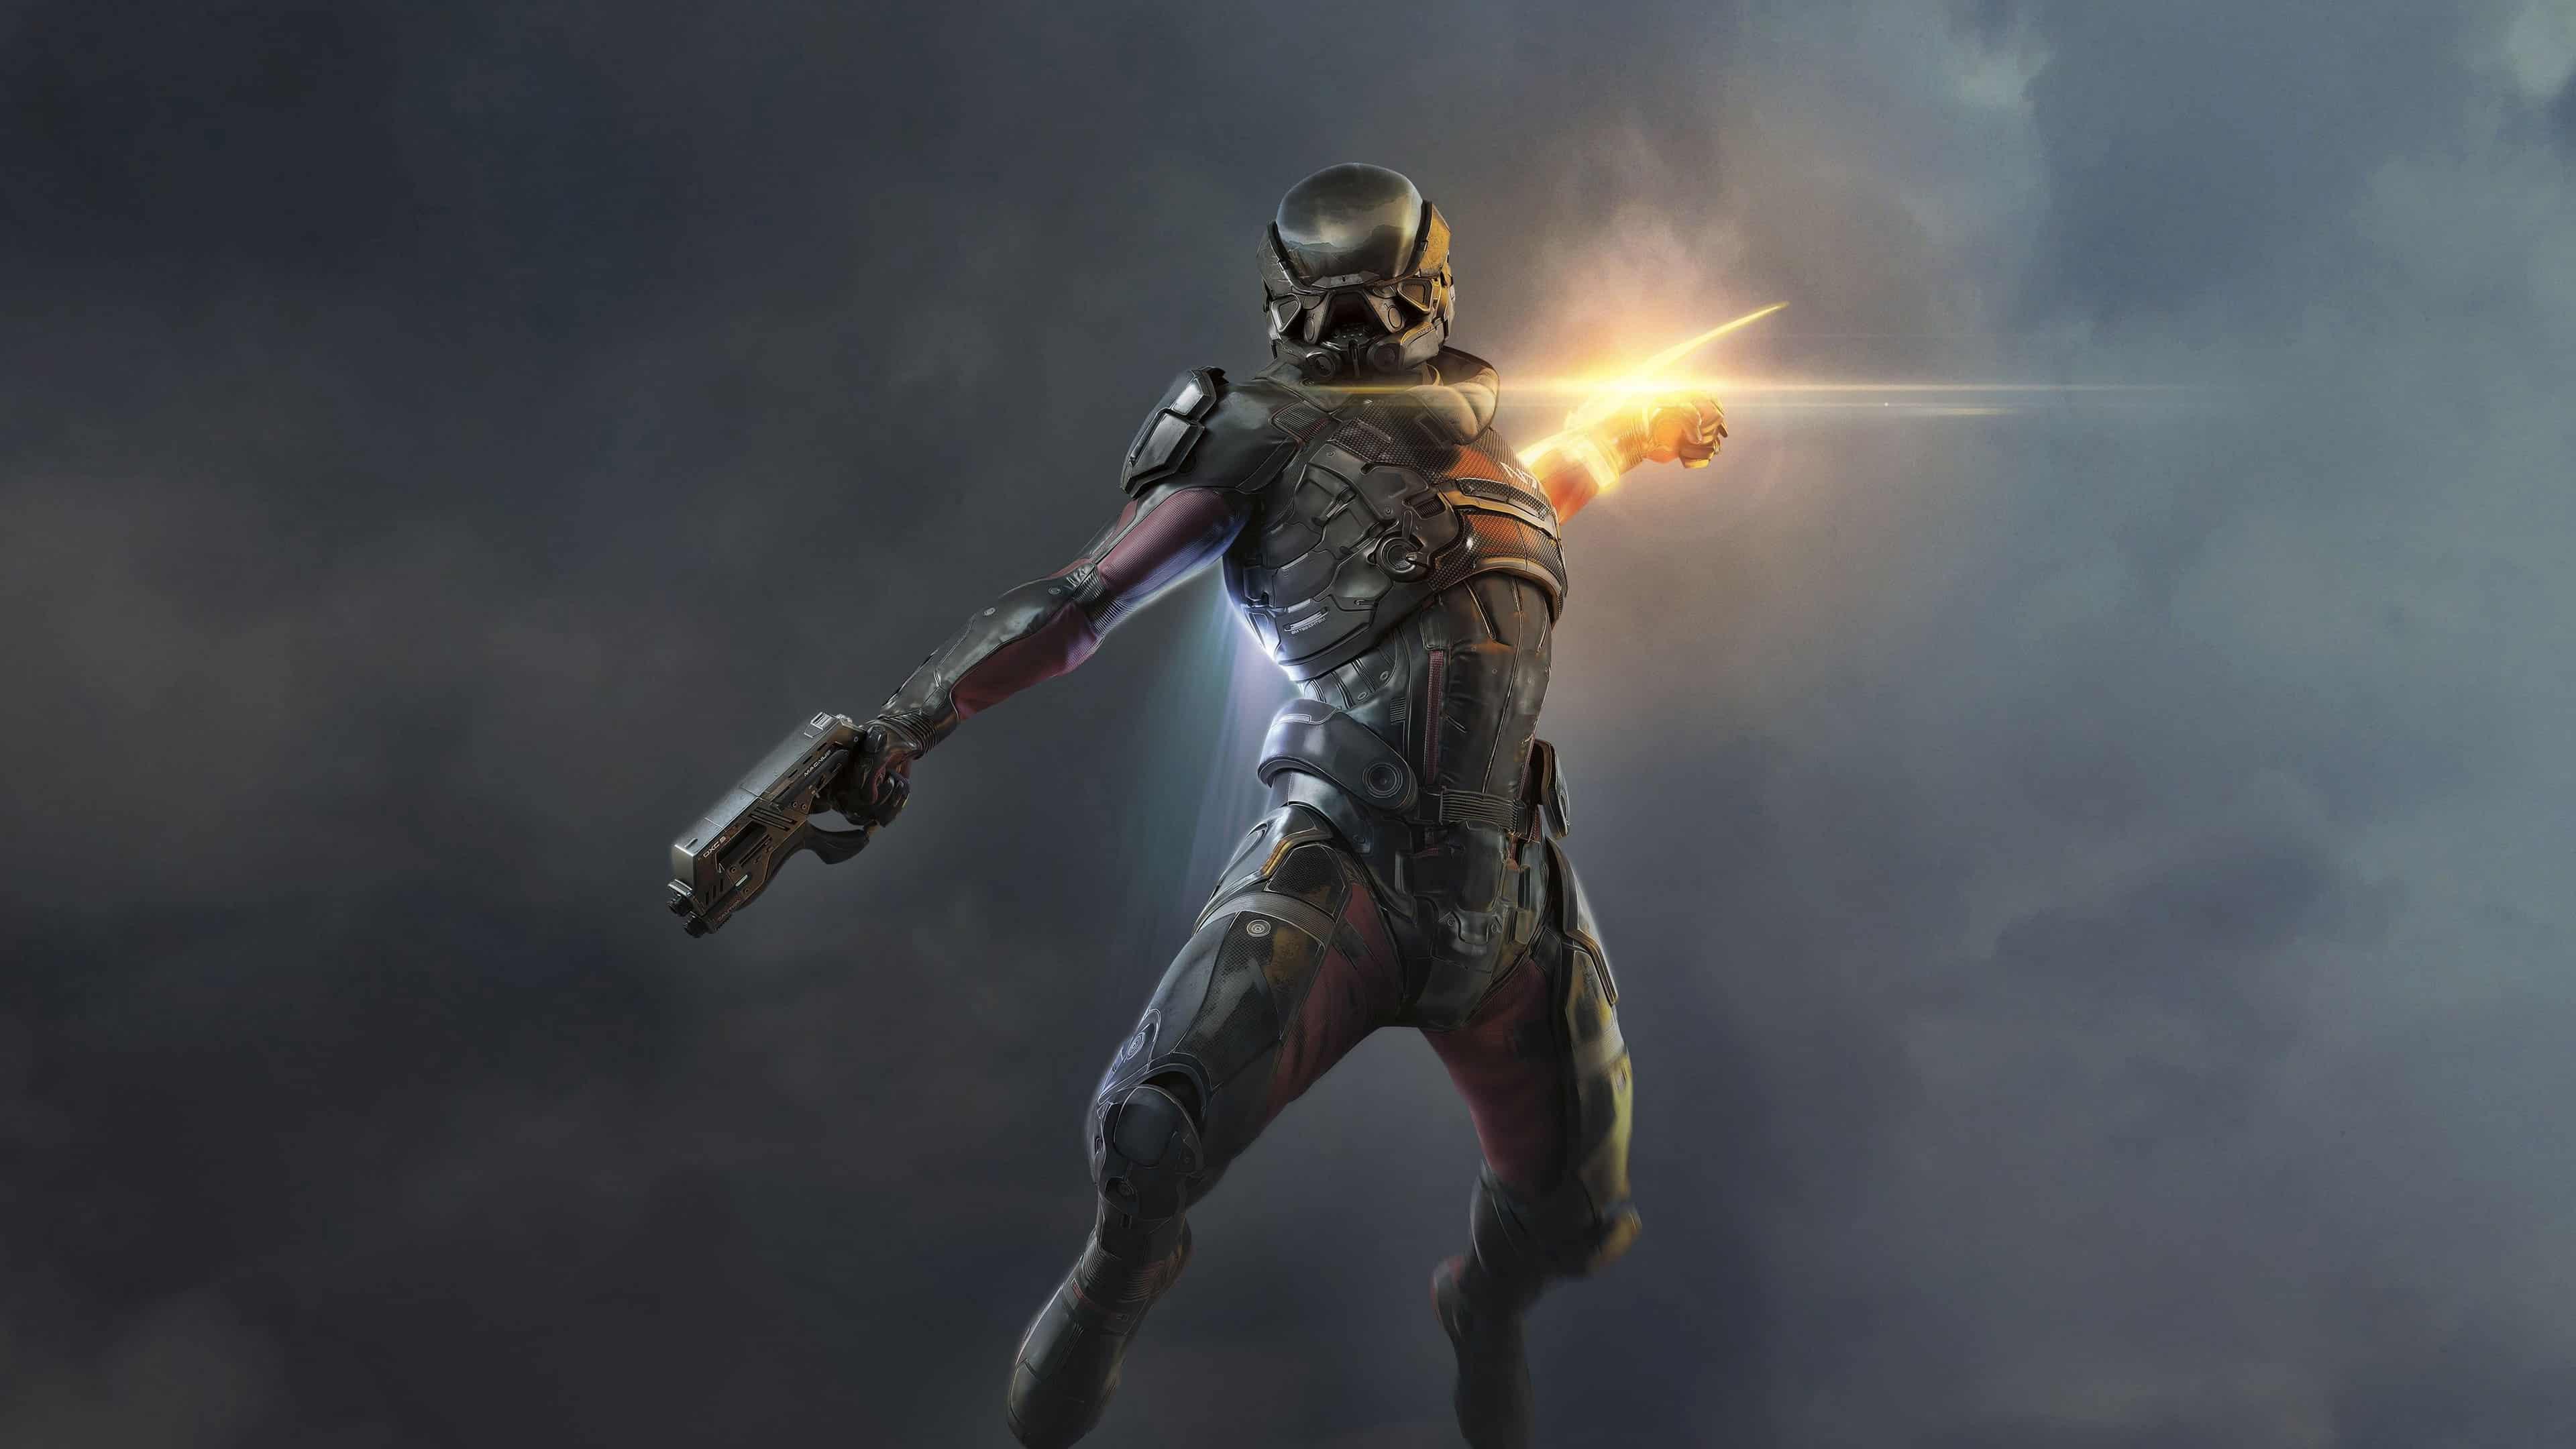 Mass Effect 4 Andromeda Ryder Uhd 4k Wallpaper Pixelz